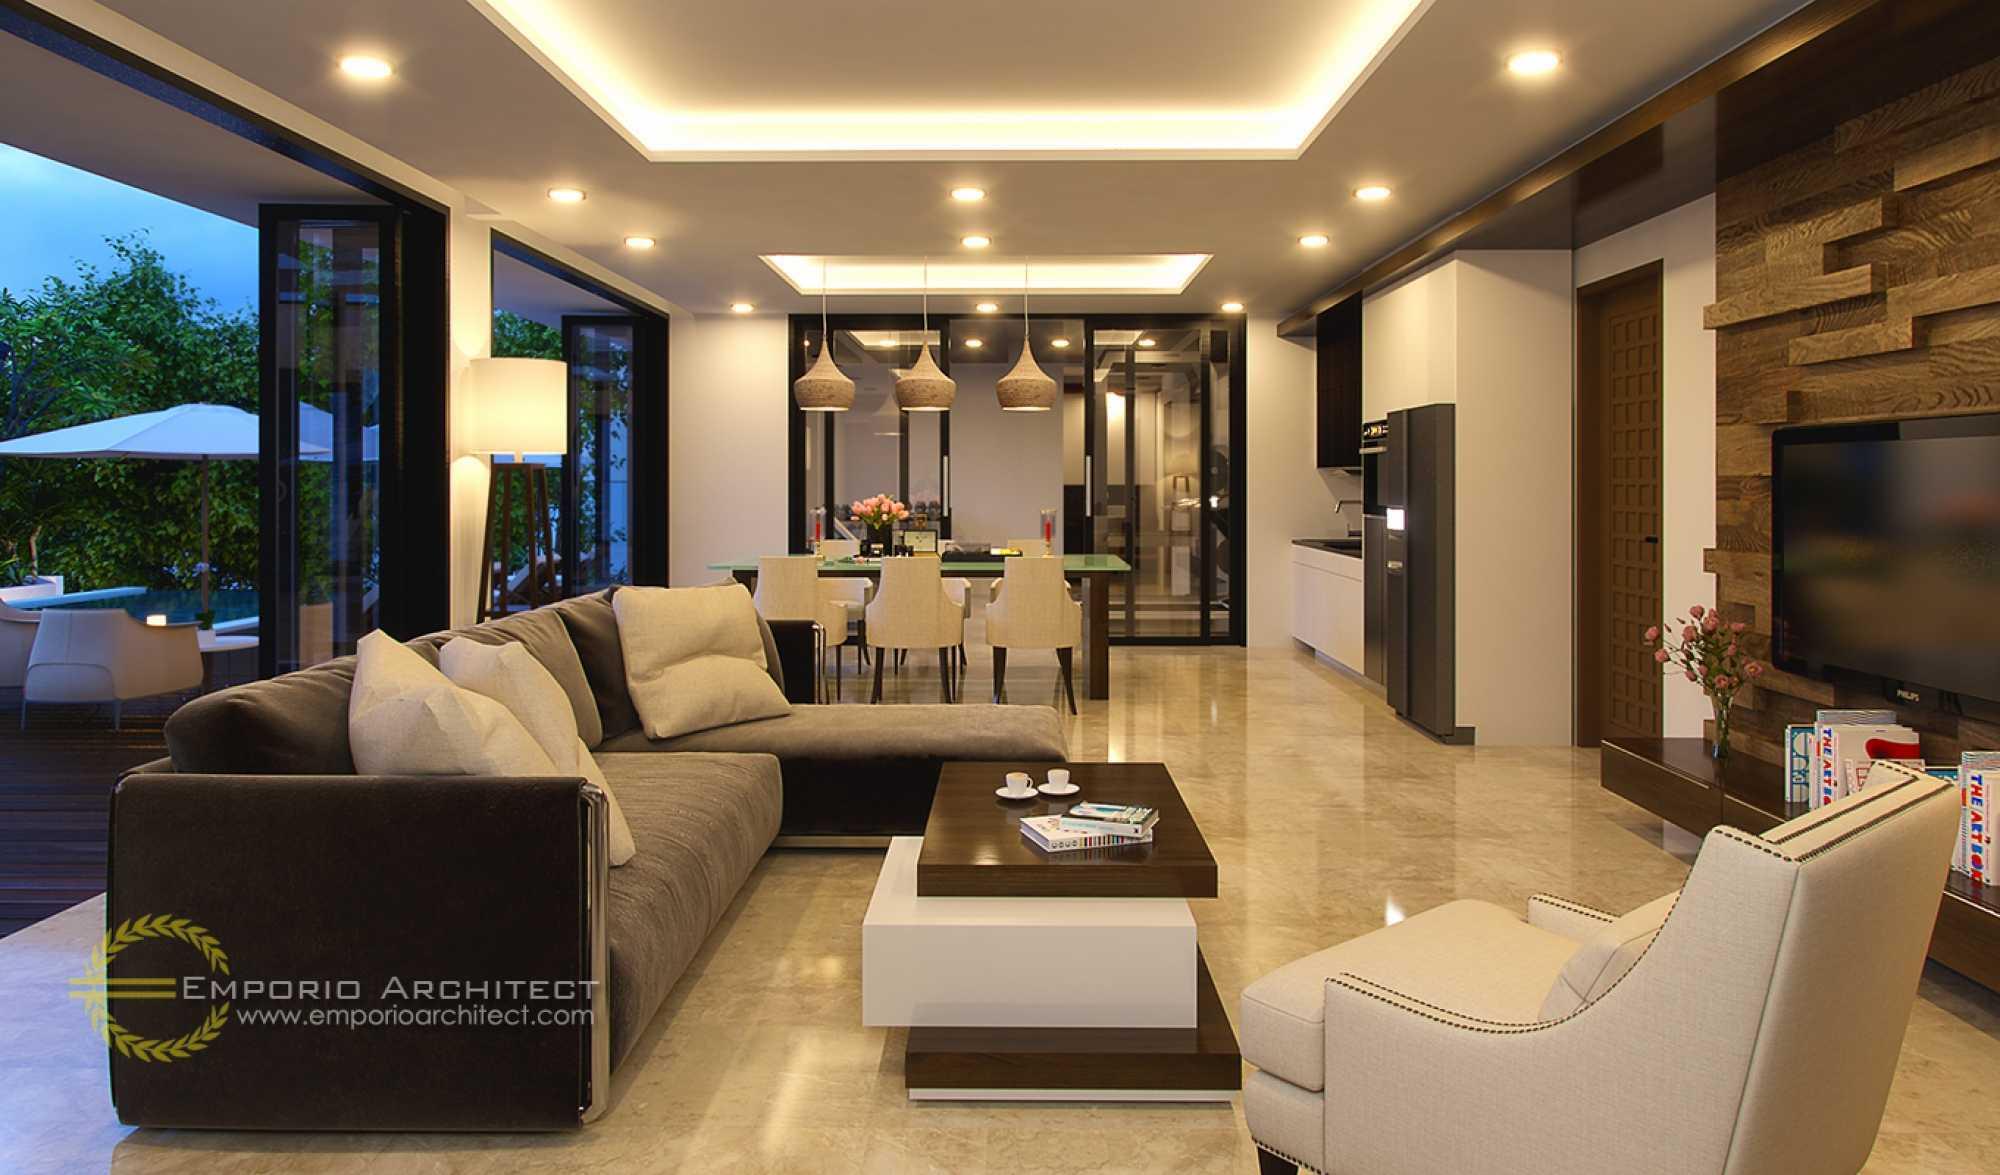 Emporio Architect Desain Rumah Villa Bali Tropis 242 @ Bogor, Jawa Barat Bogor, Jawa Barat, Indonesia Bogor, Jawa Barat, Indonesia Emporio-Architect-Desain-Rumah-Villa-Bali-Tropis-242-Bogor-Jawa-Barat   73276